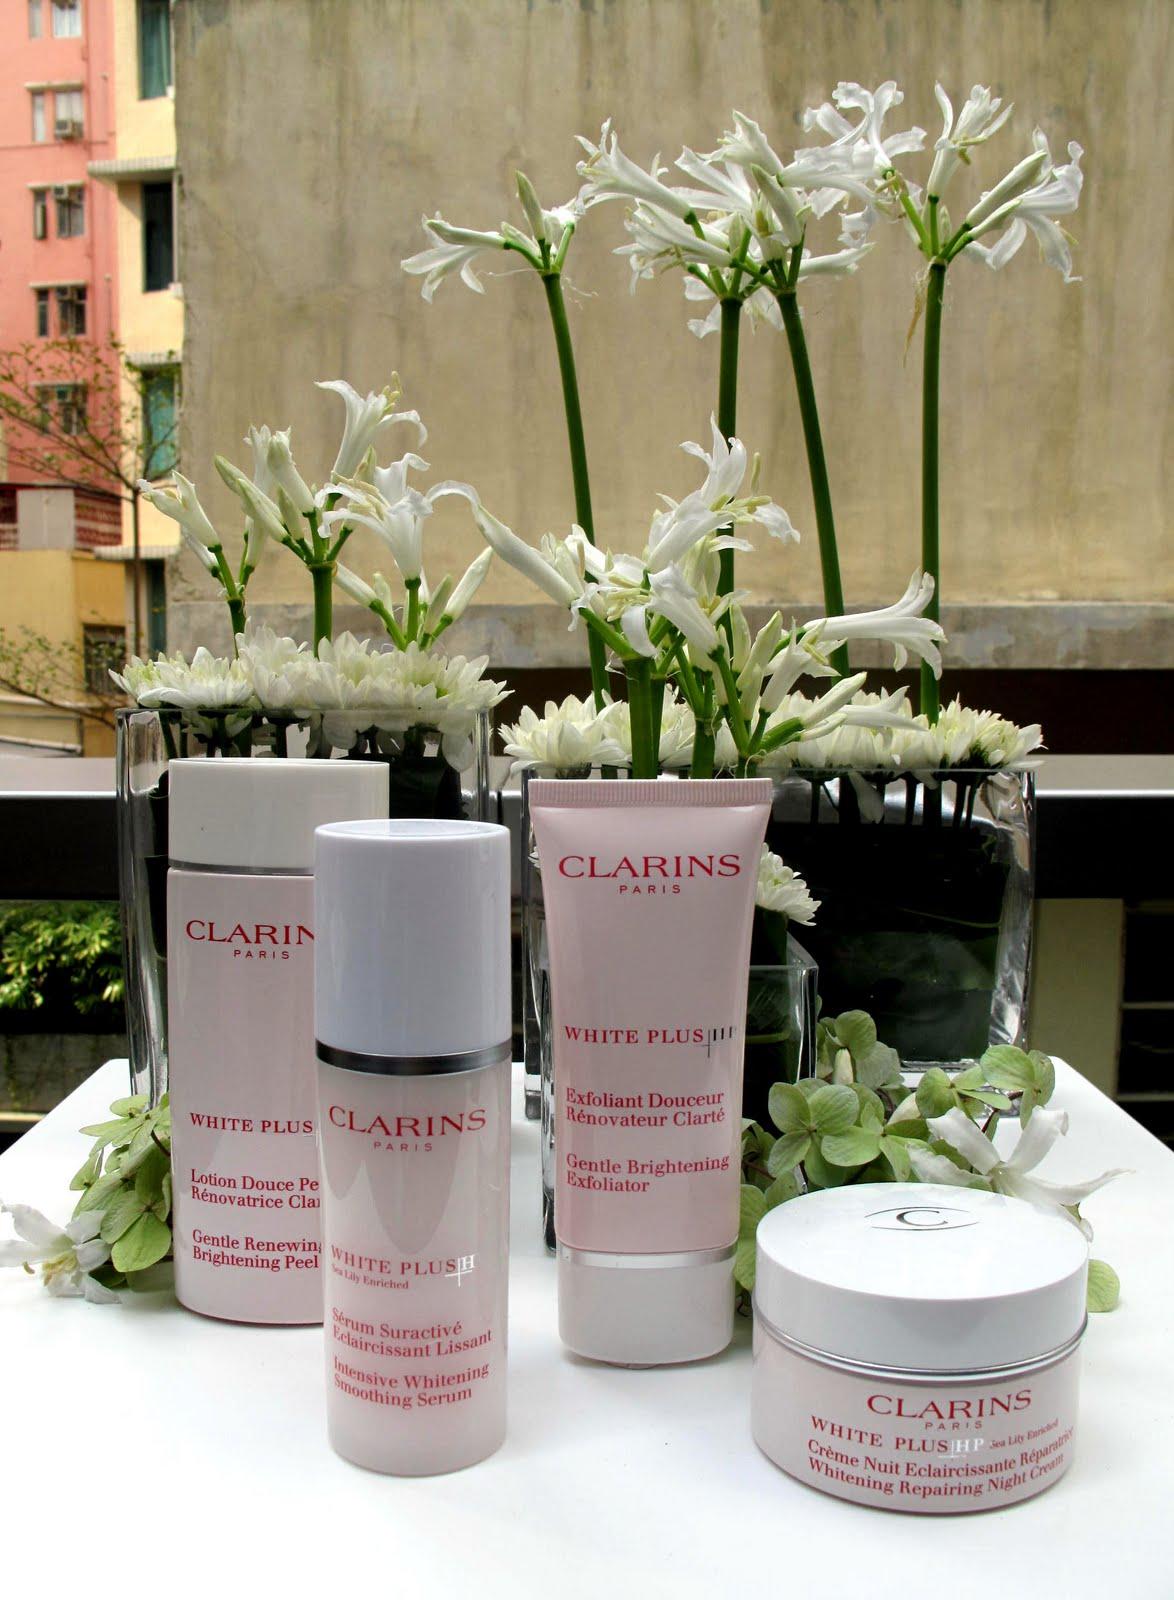 clarins whitening 美白 skincare 廚魔 分子料理 bo innovation